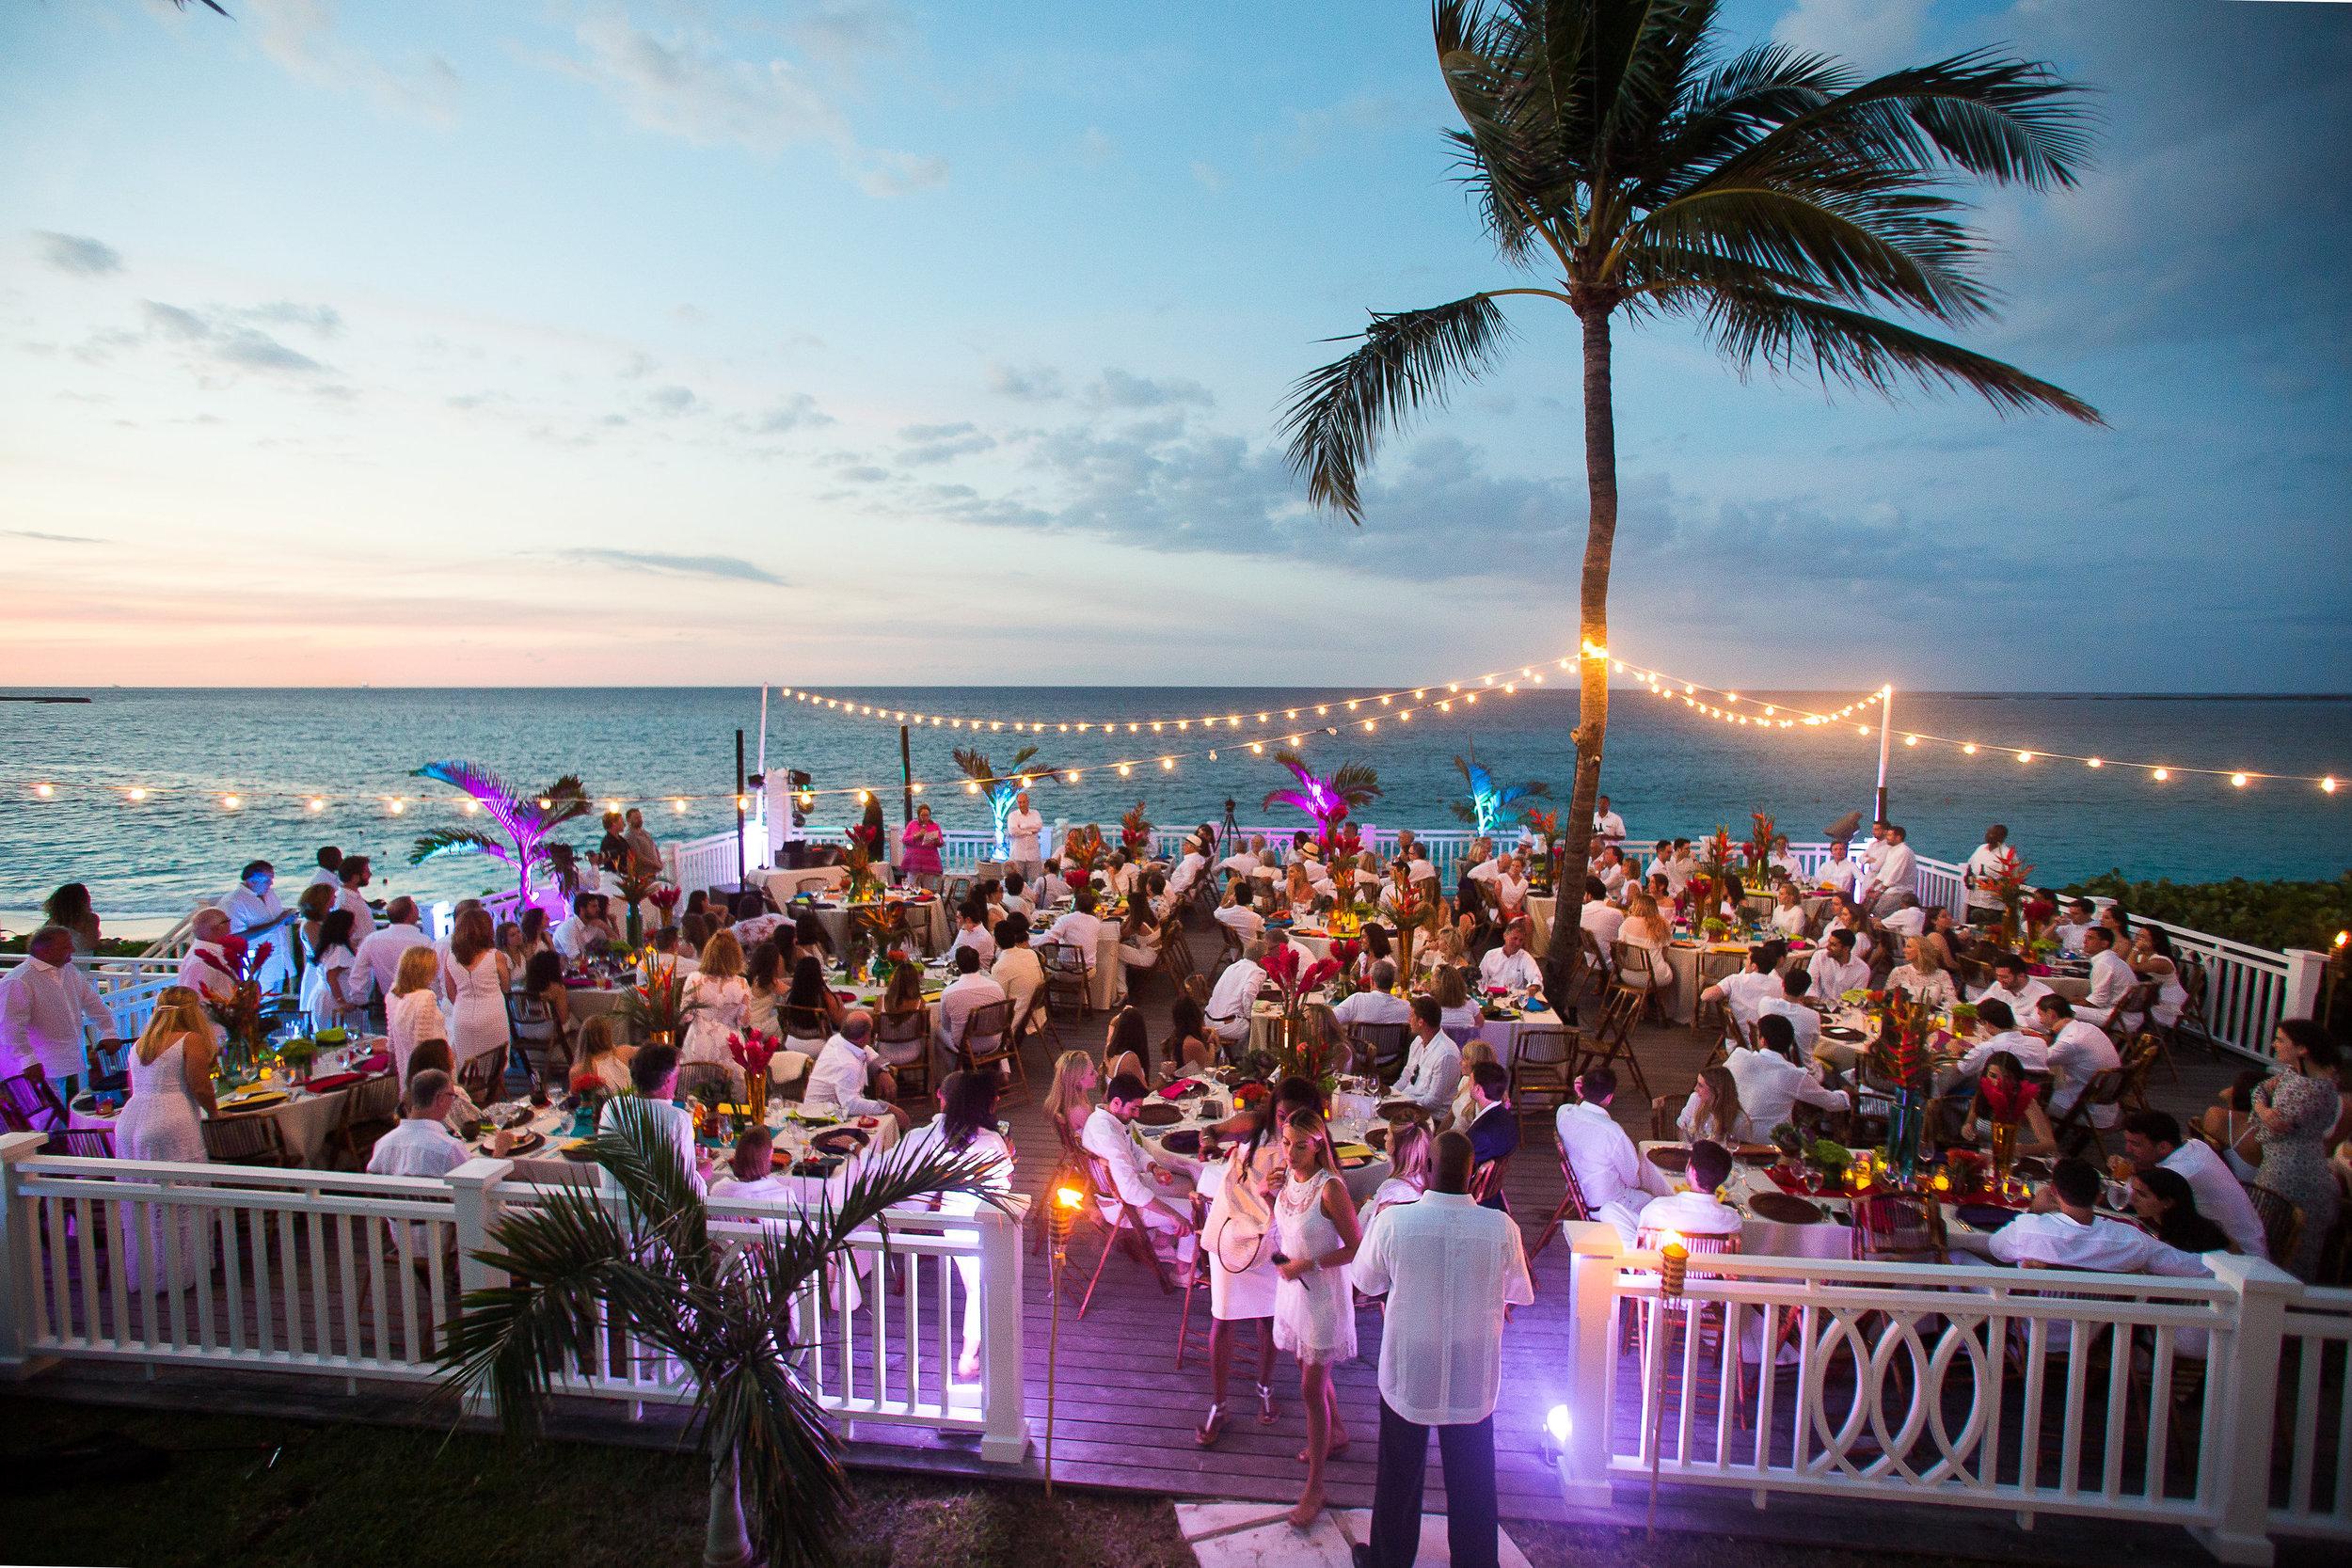 Ceci_New_York_Ceci_Style_Ceci_Johnson_Luxury_Lifestyle_Destination_Bahamas_Wedding_Letterpress_Inspiration_Design_Custom_Couture_Personalized_Invitations_39.jpg